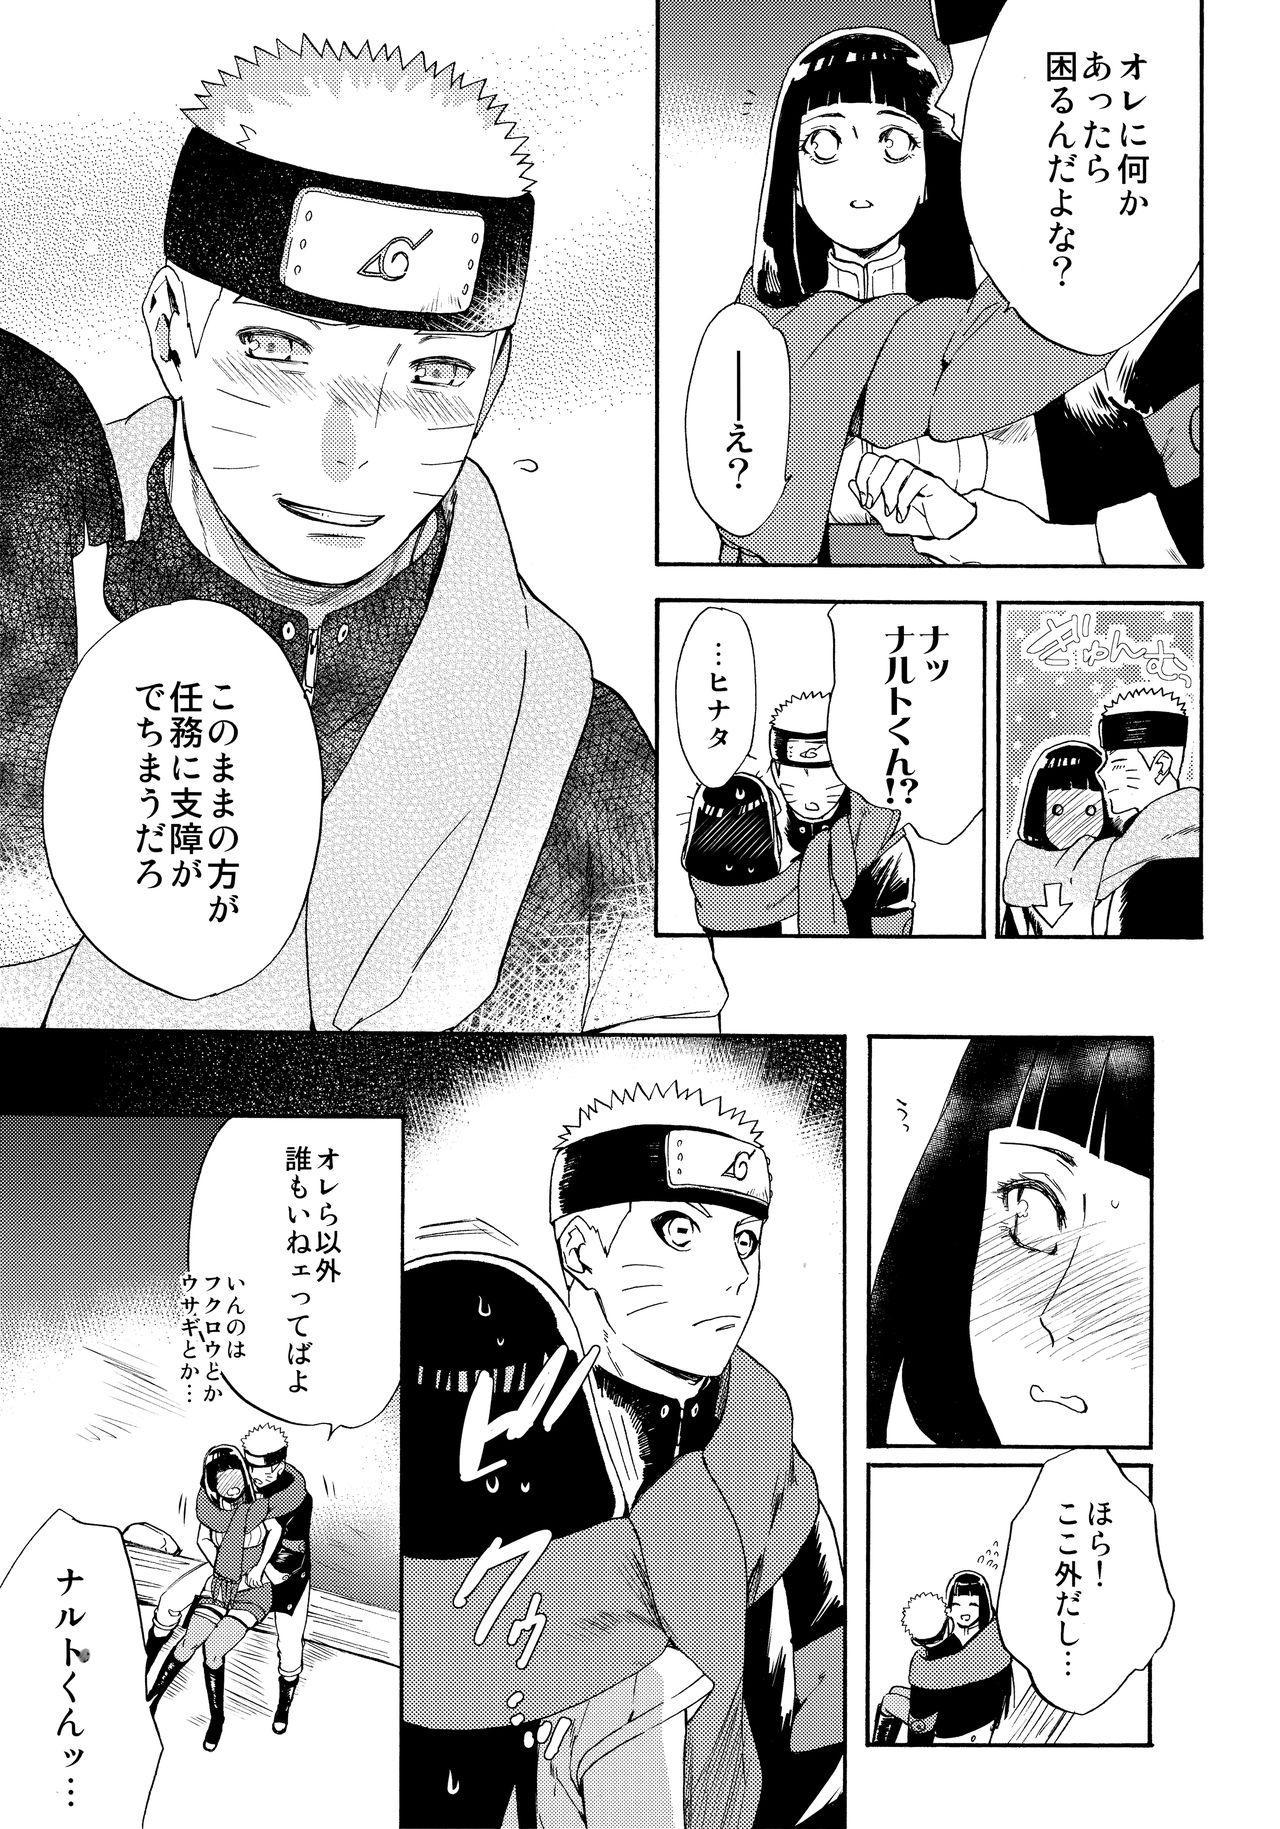 Hime Hajime 5